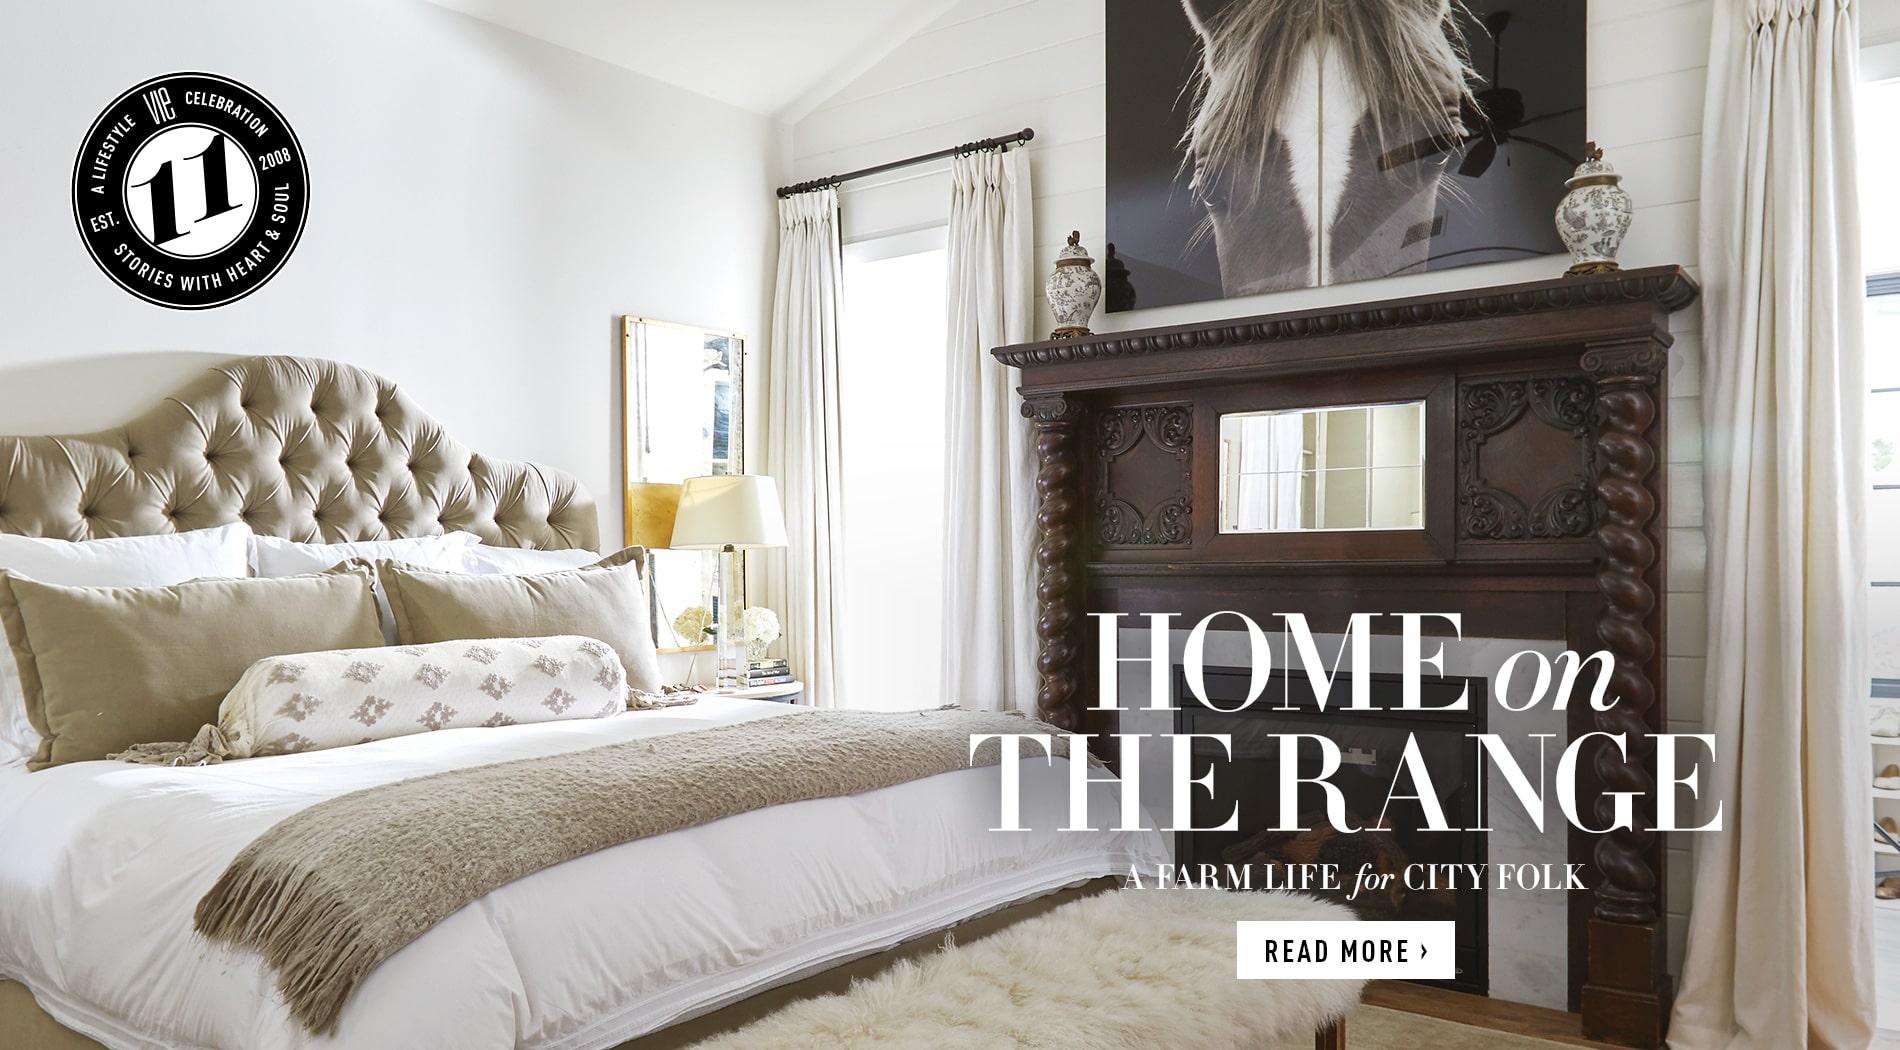 VIE Magazine February 2019 Luxury Homes & Technology Issue - Geoff Chick Home